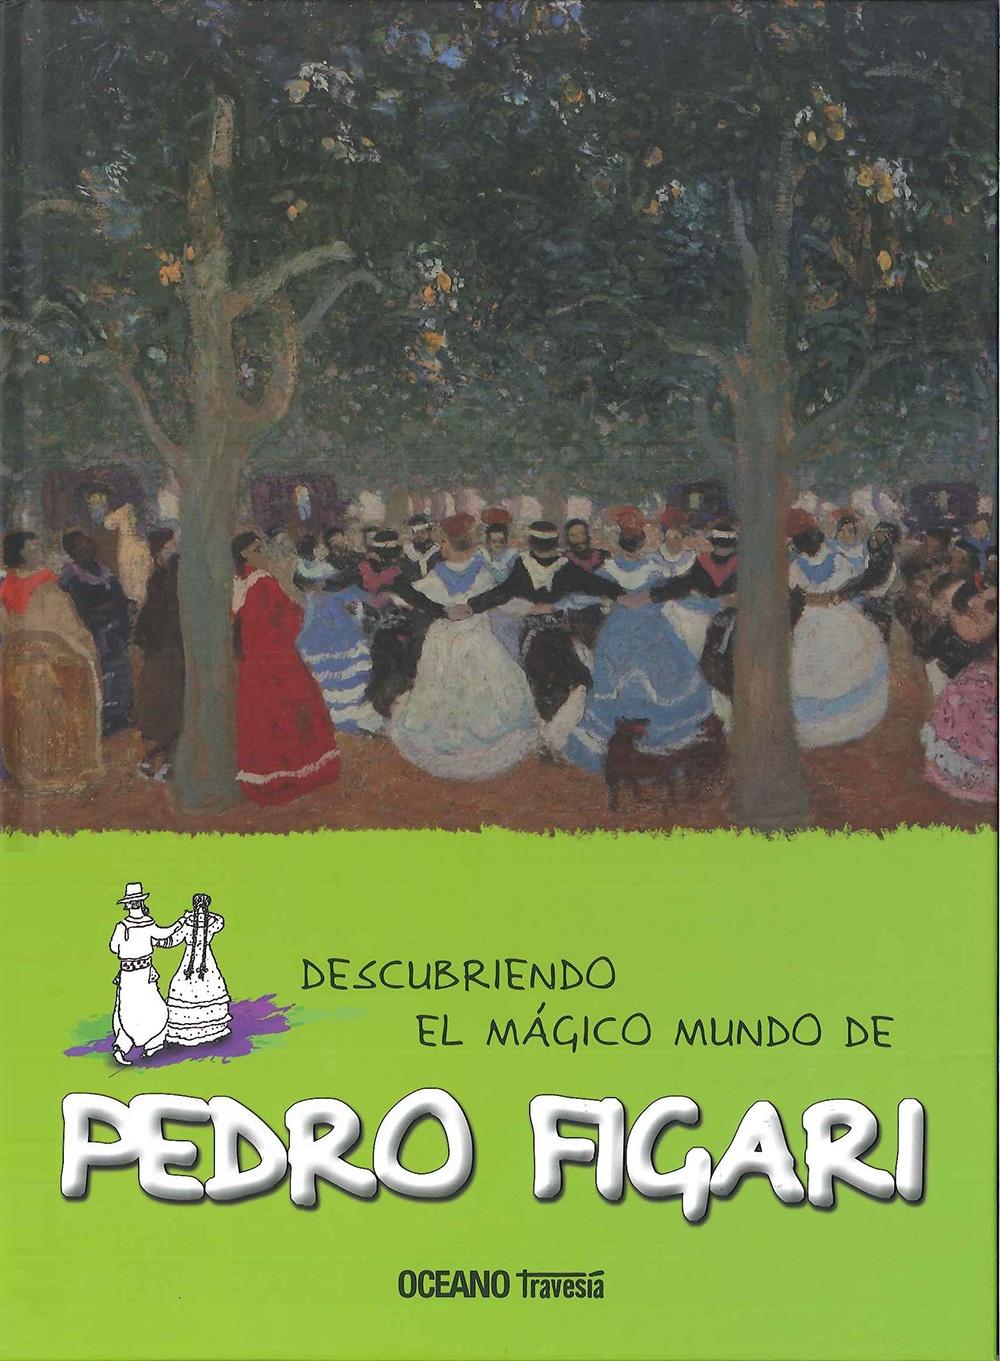 Pedro Figari